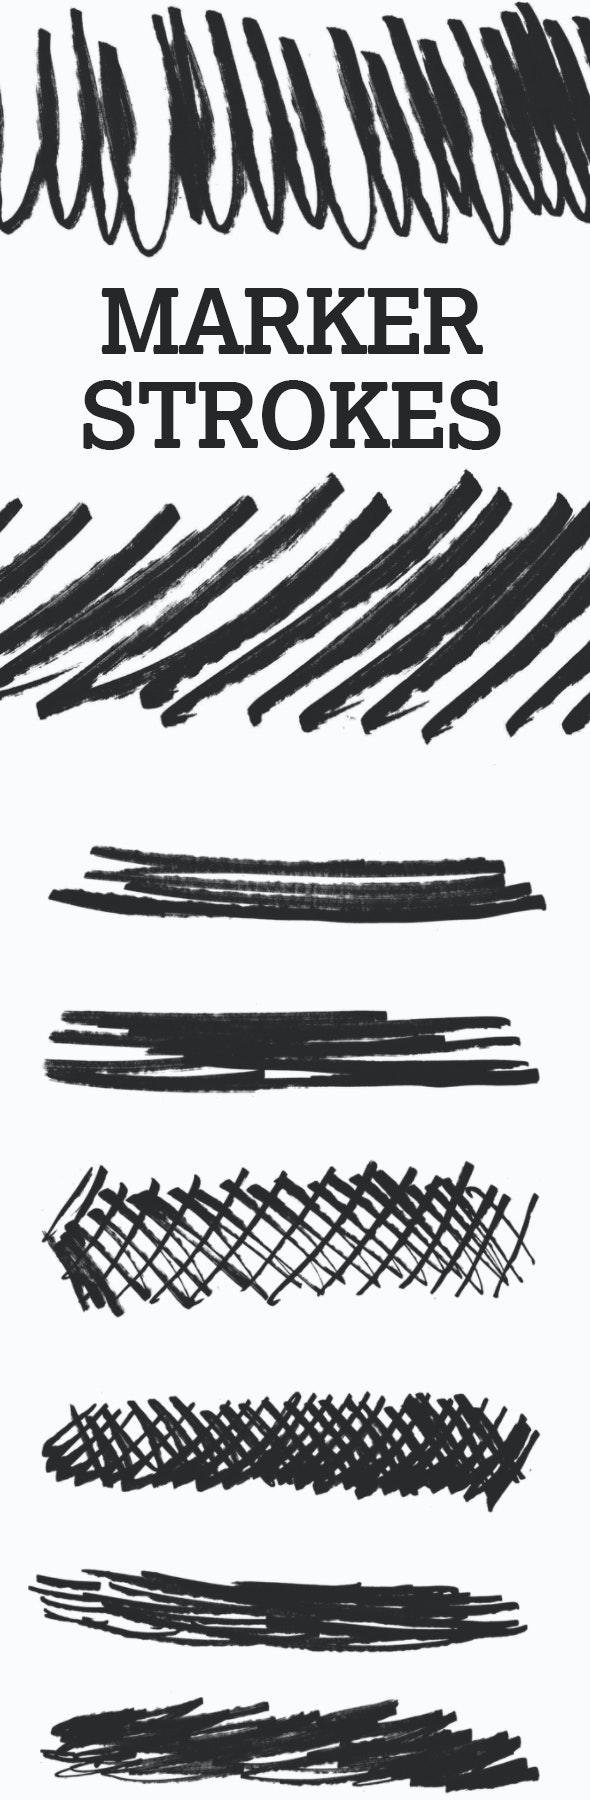 20 Permanent Marker Strokes - Brushes Photoshop